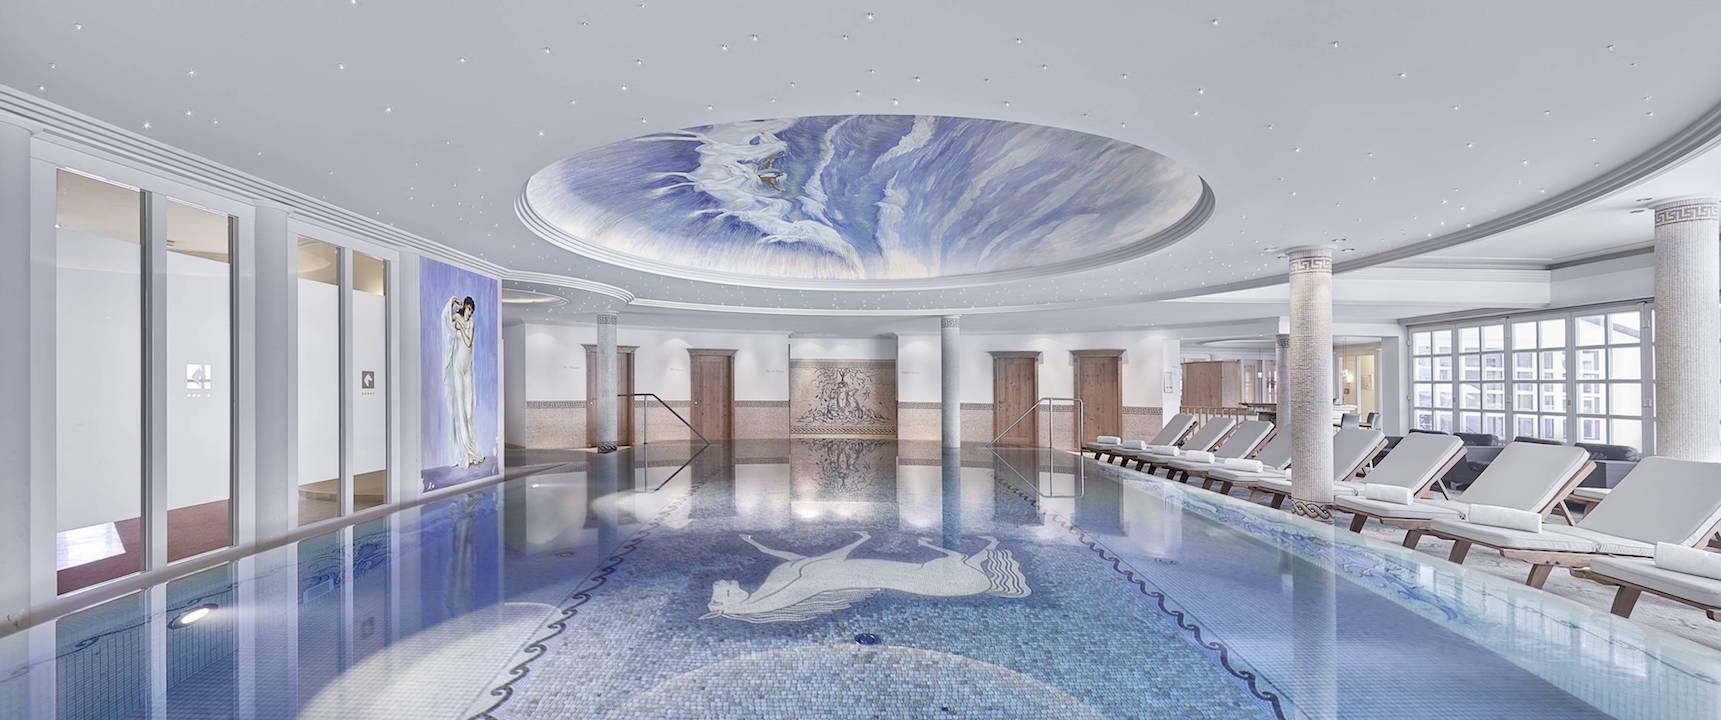 Hotel Weisses Roessl , Kitzbuehel / Austria